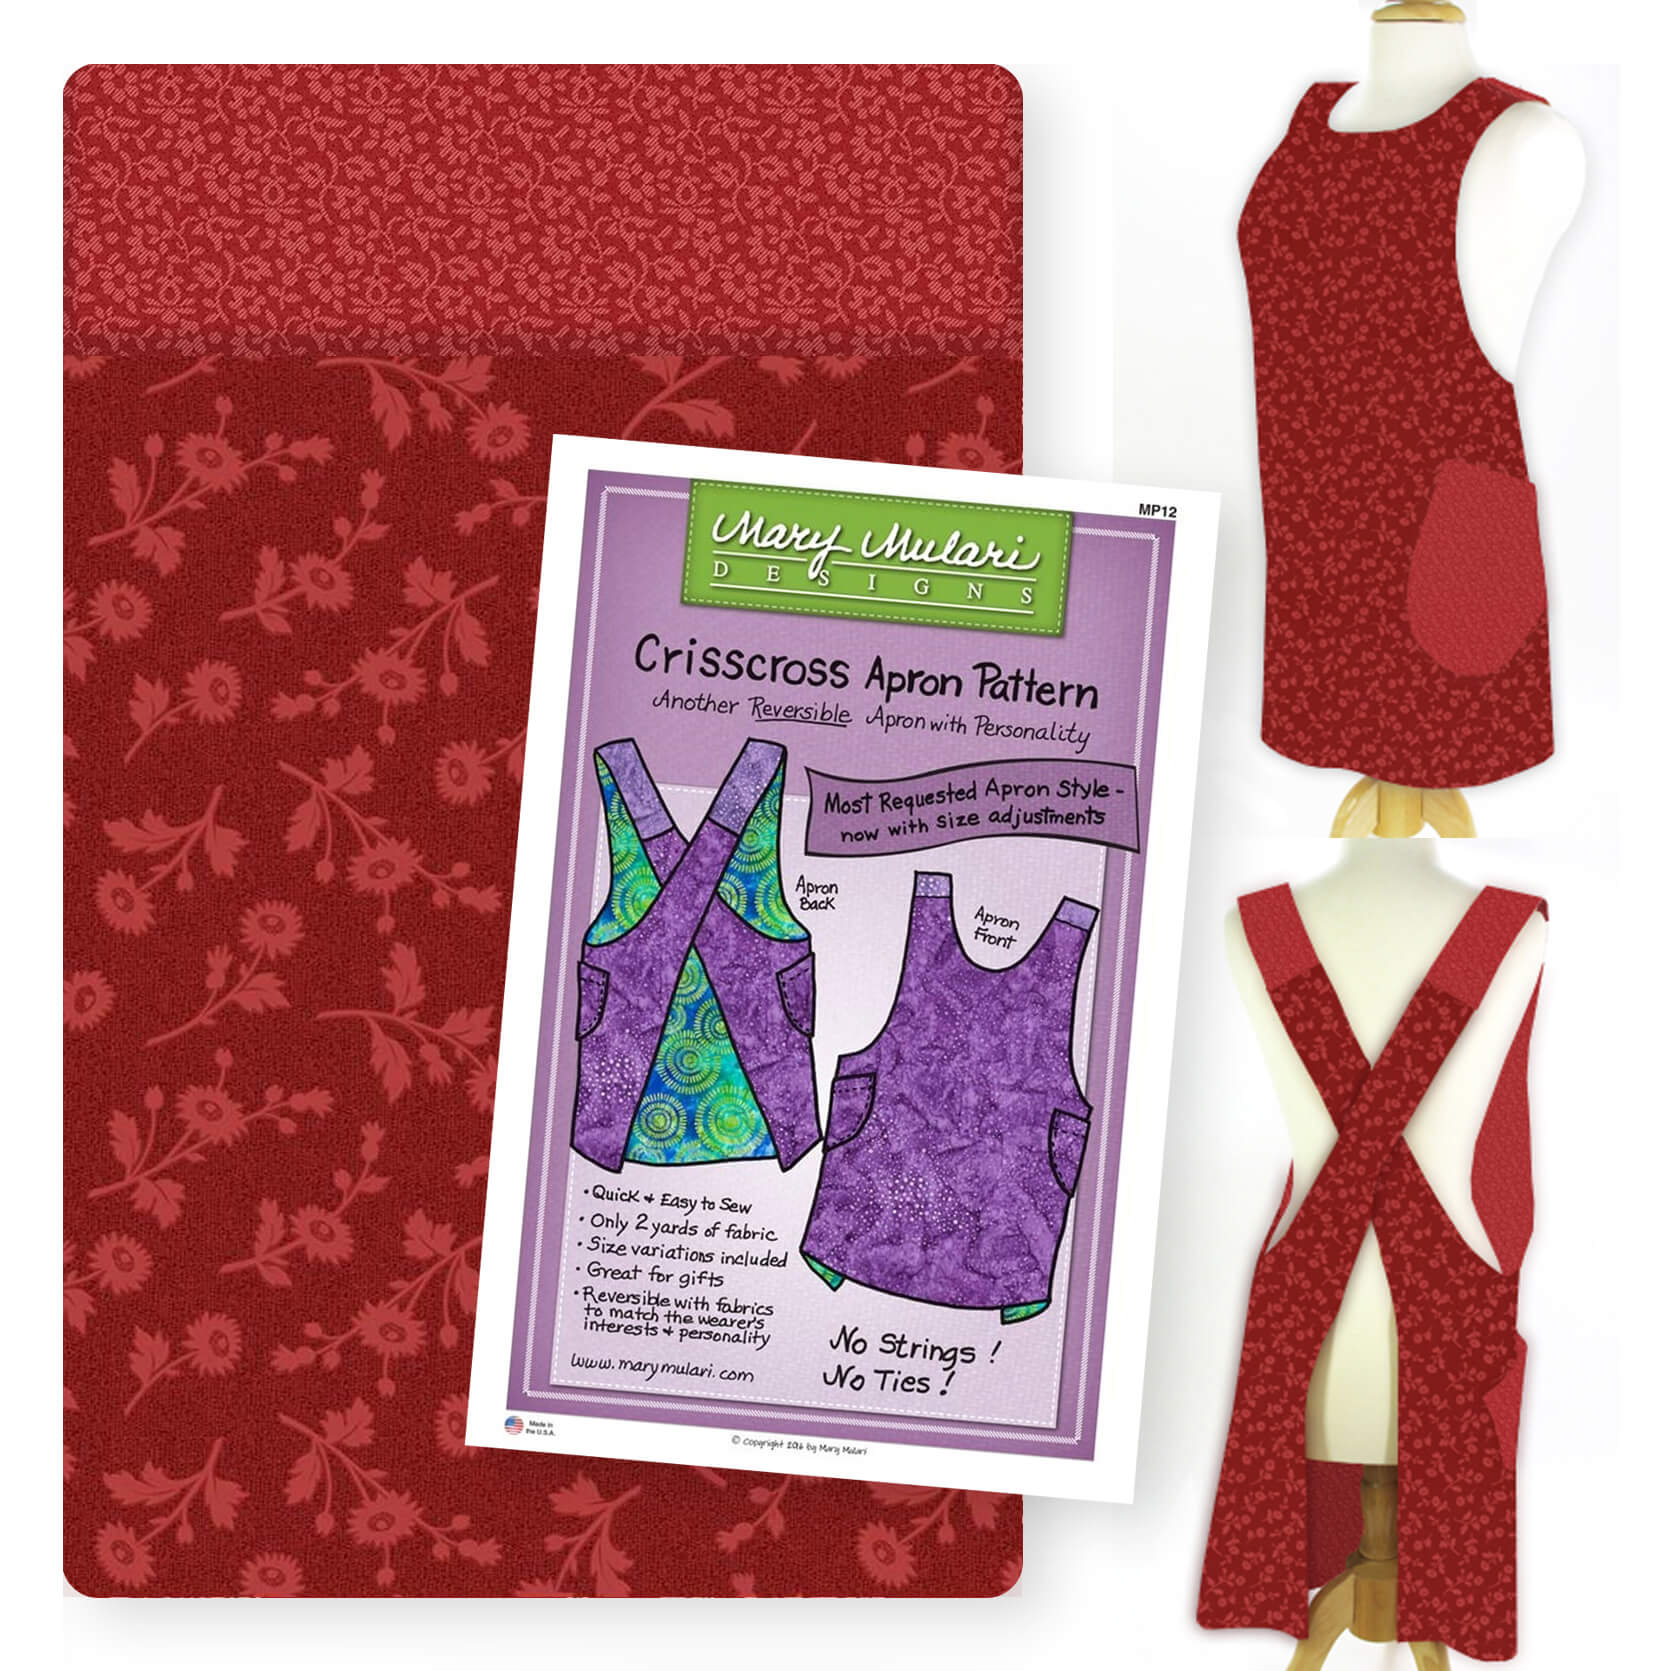 VDBRRCAB Valentines Day Brick Red Crisscross Apron Bundle available at Nancy Zieman Productions at ShopNZP.com